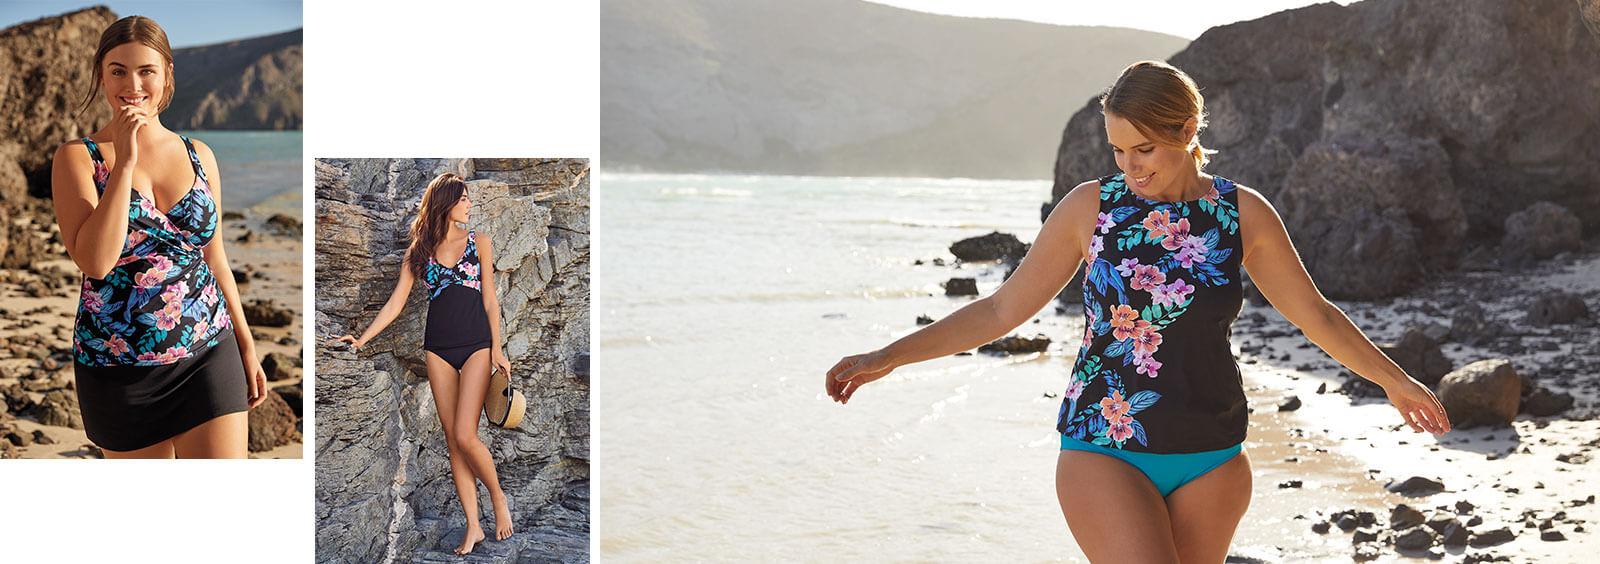 Finding Modest Coverage Swimwear for Women